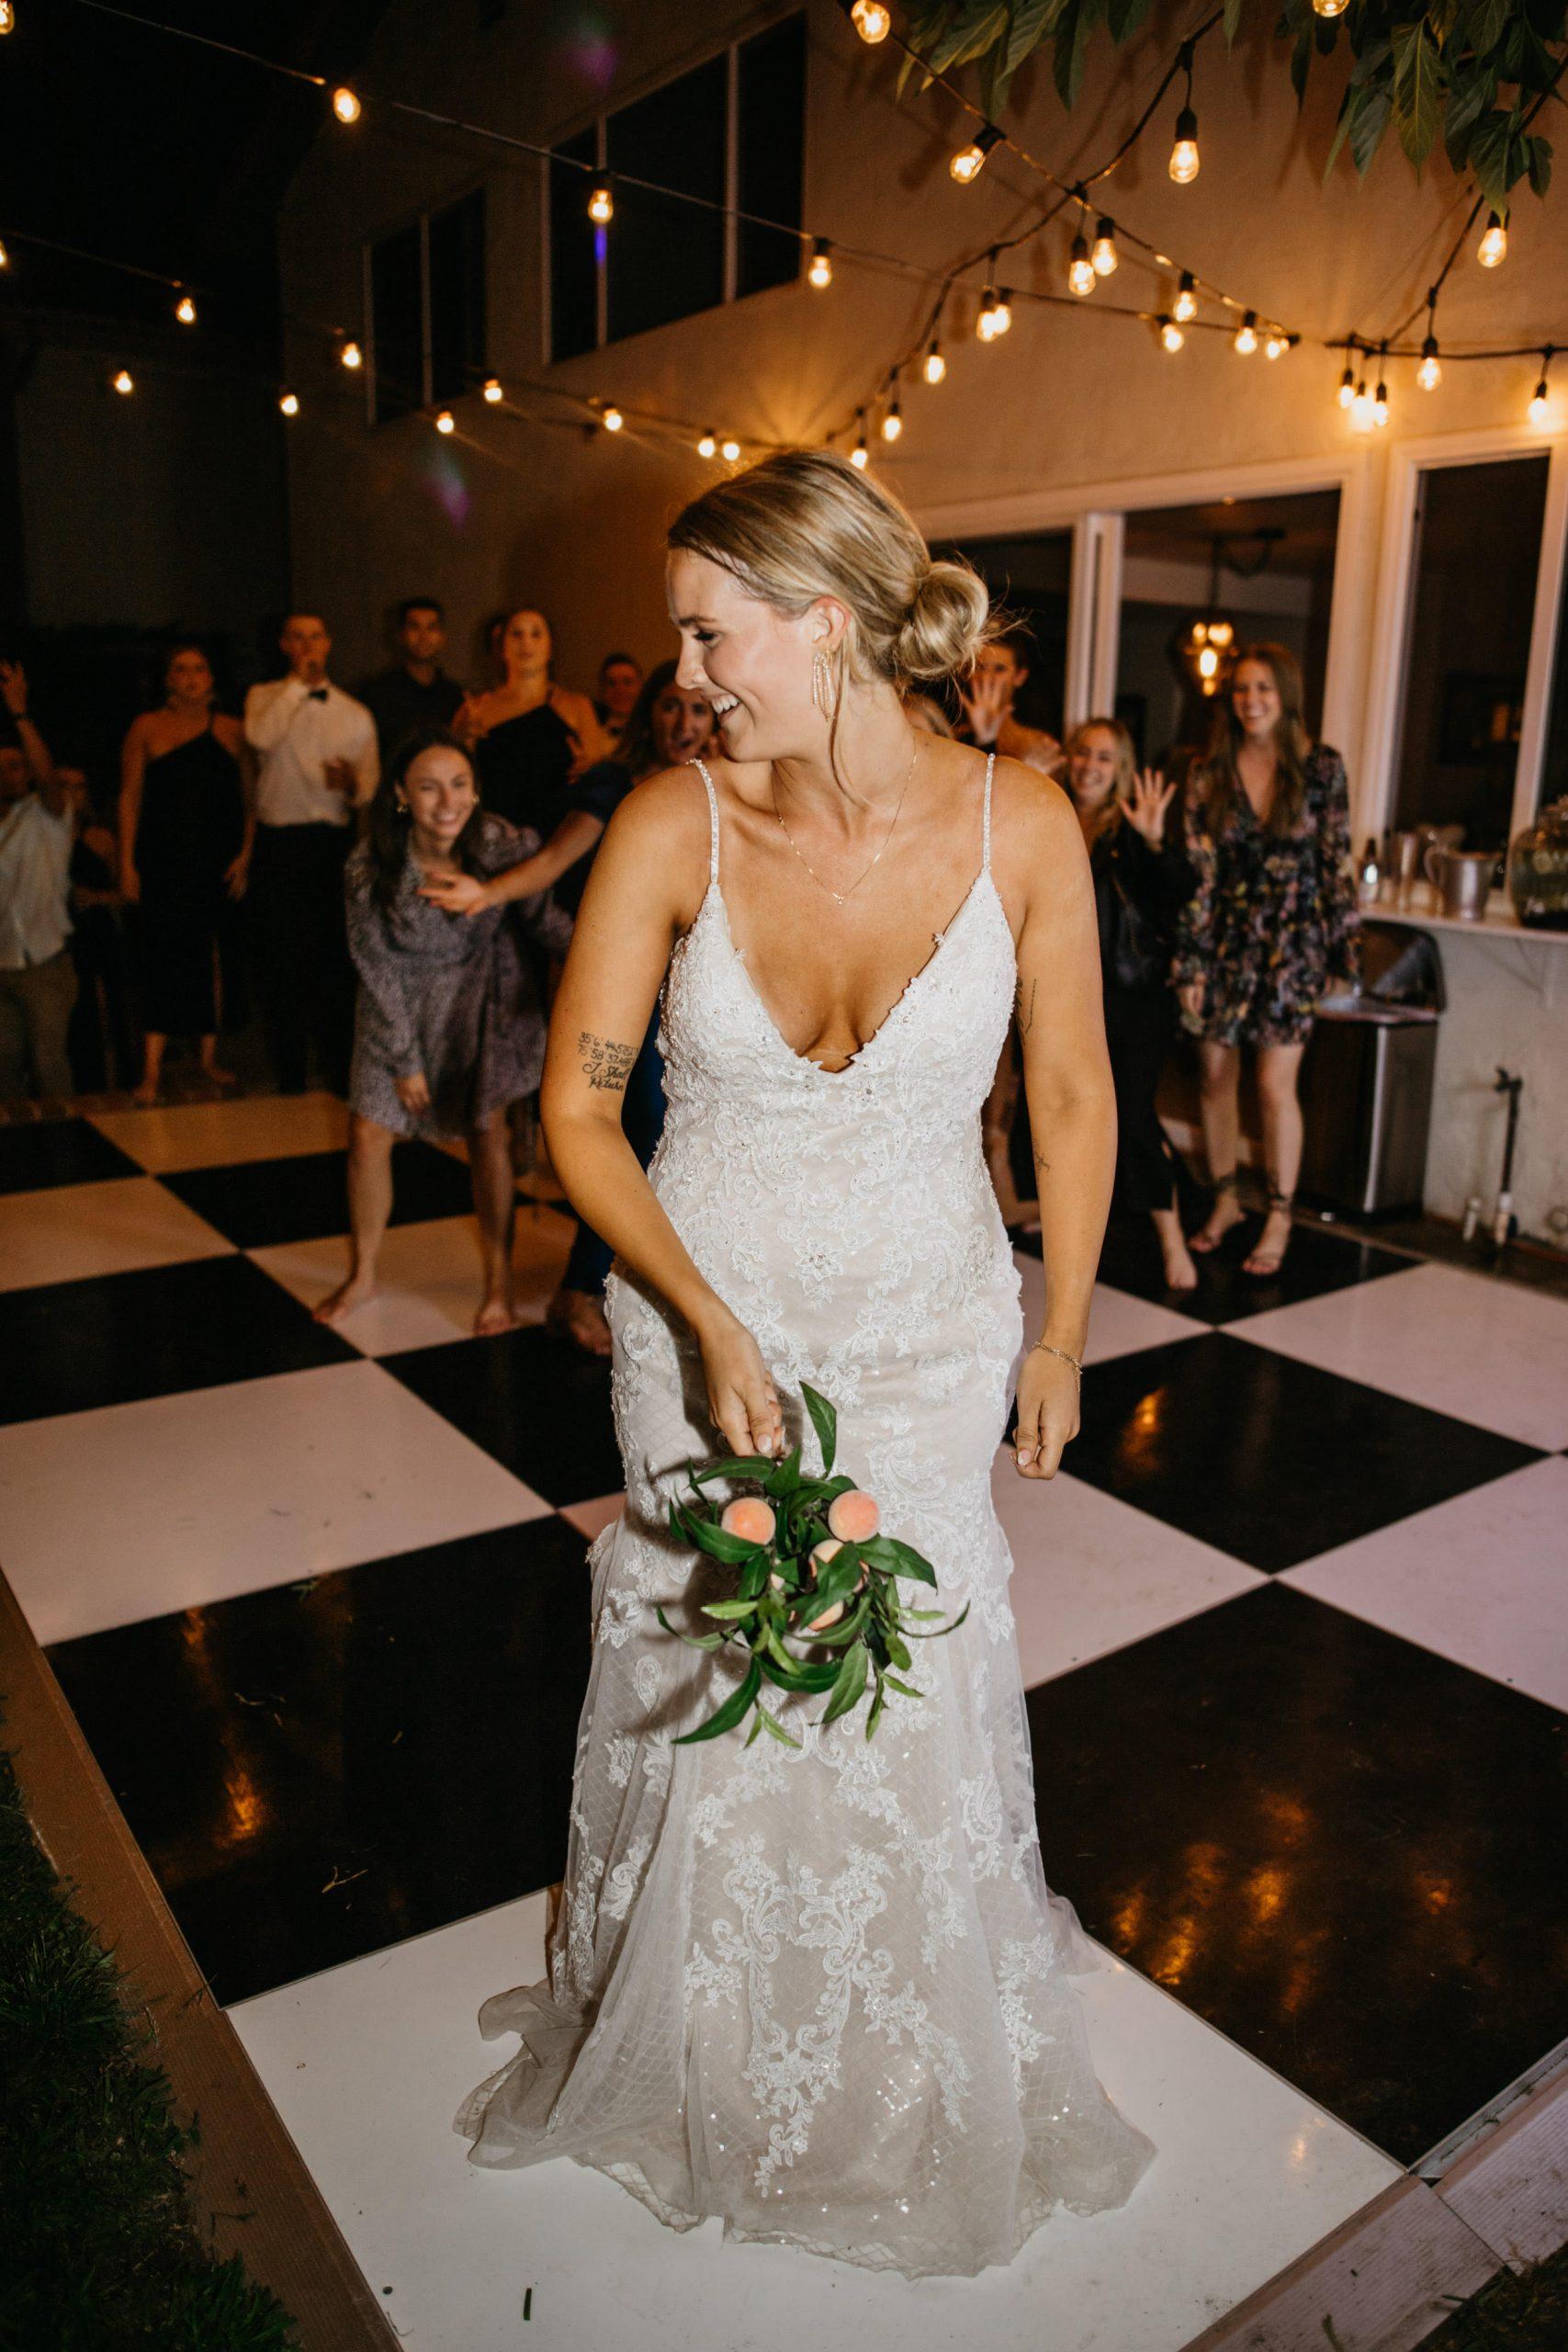 Bouquet toss in Laguna Beach Backyard Wedding, image by Fatima Elreda Photo